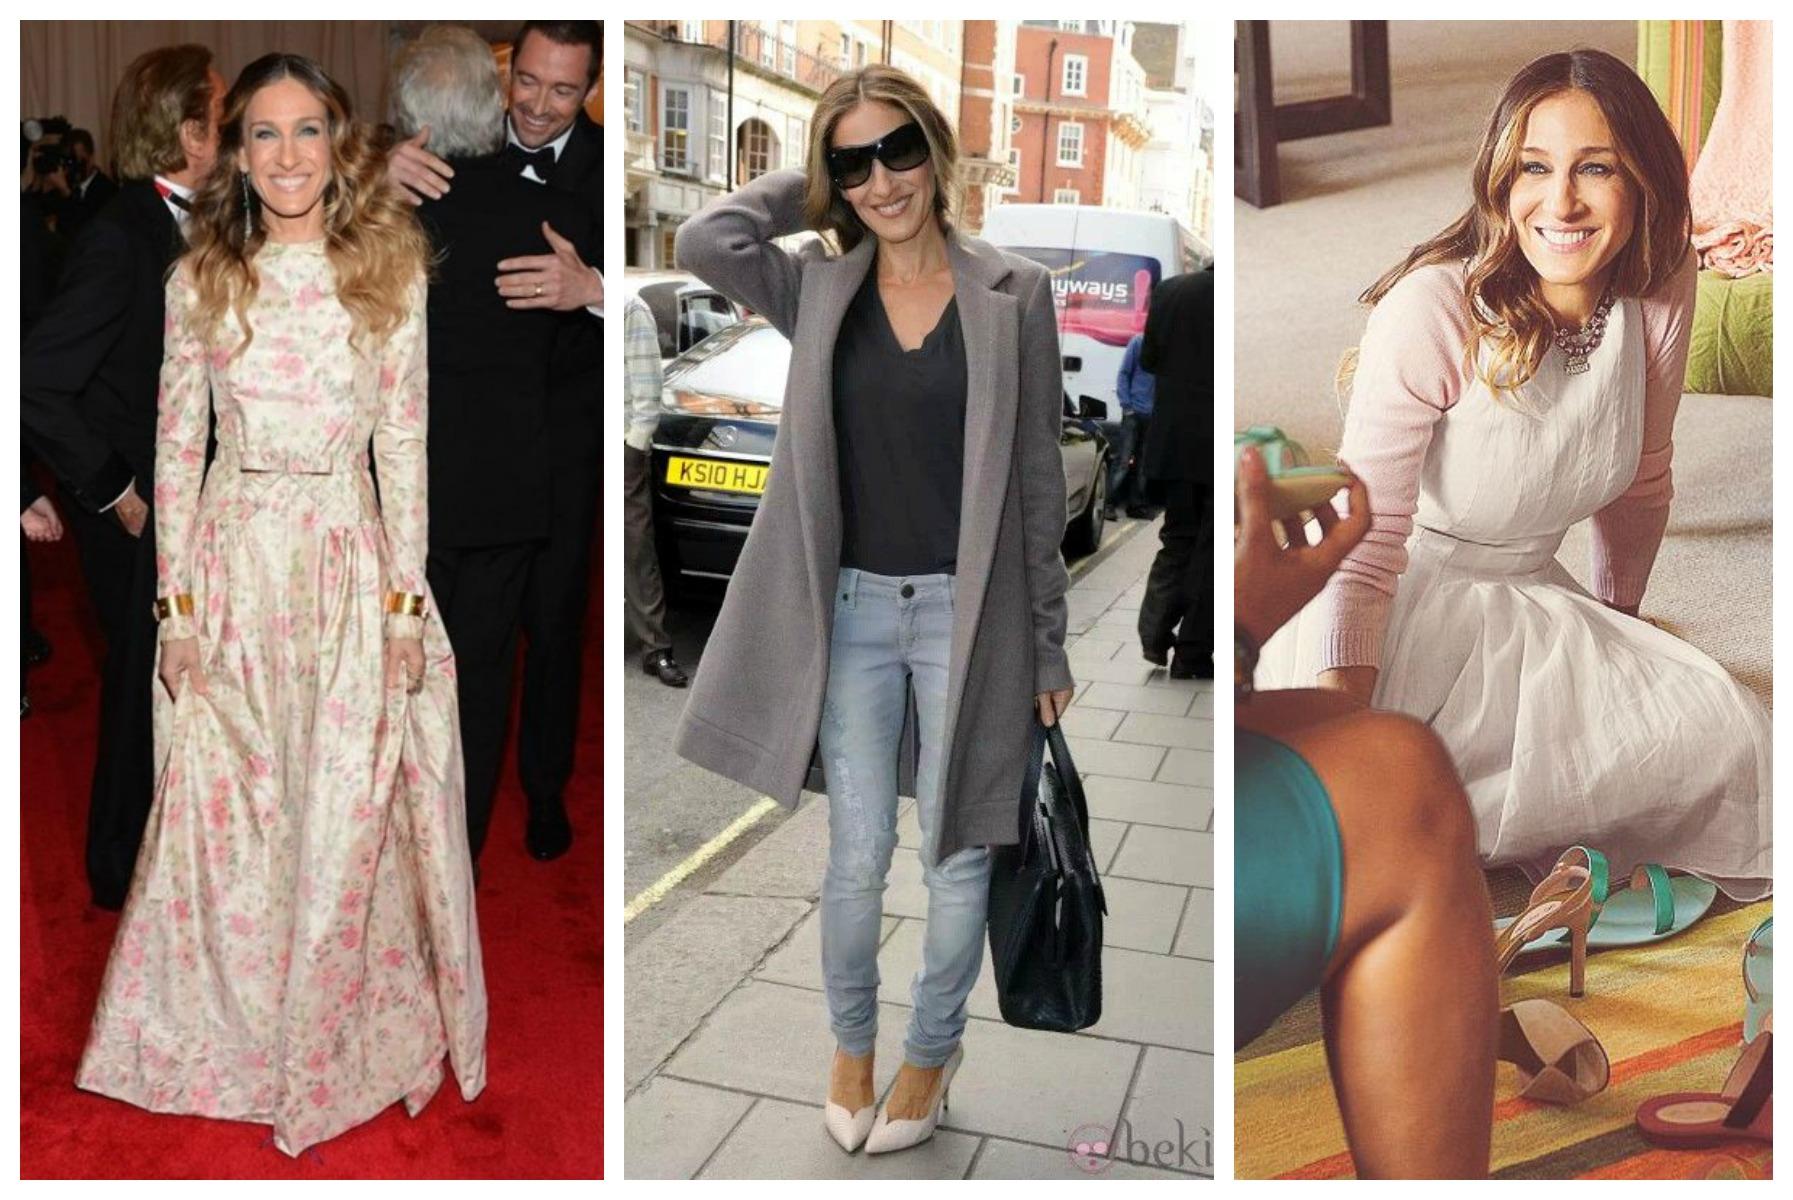 vith.es consultoria de moda estilo outfit sarah jessica parker style looks sex and the city antonio pozuelo (4)